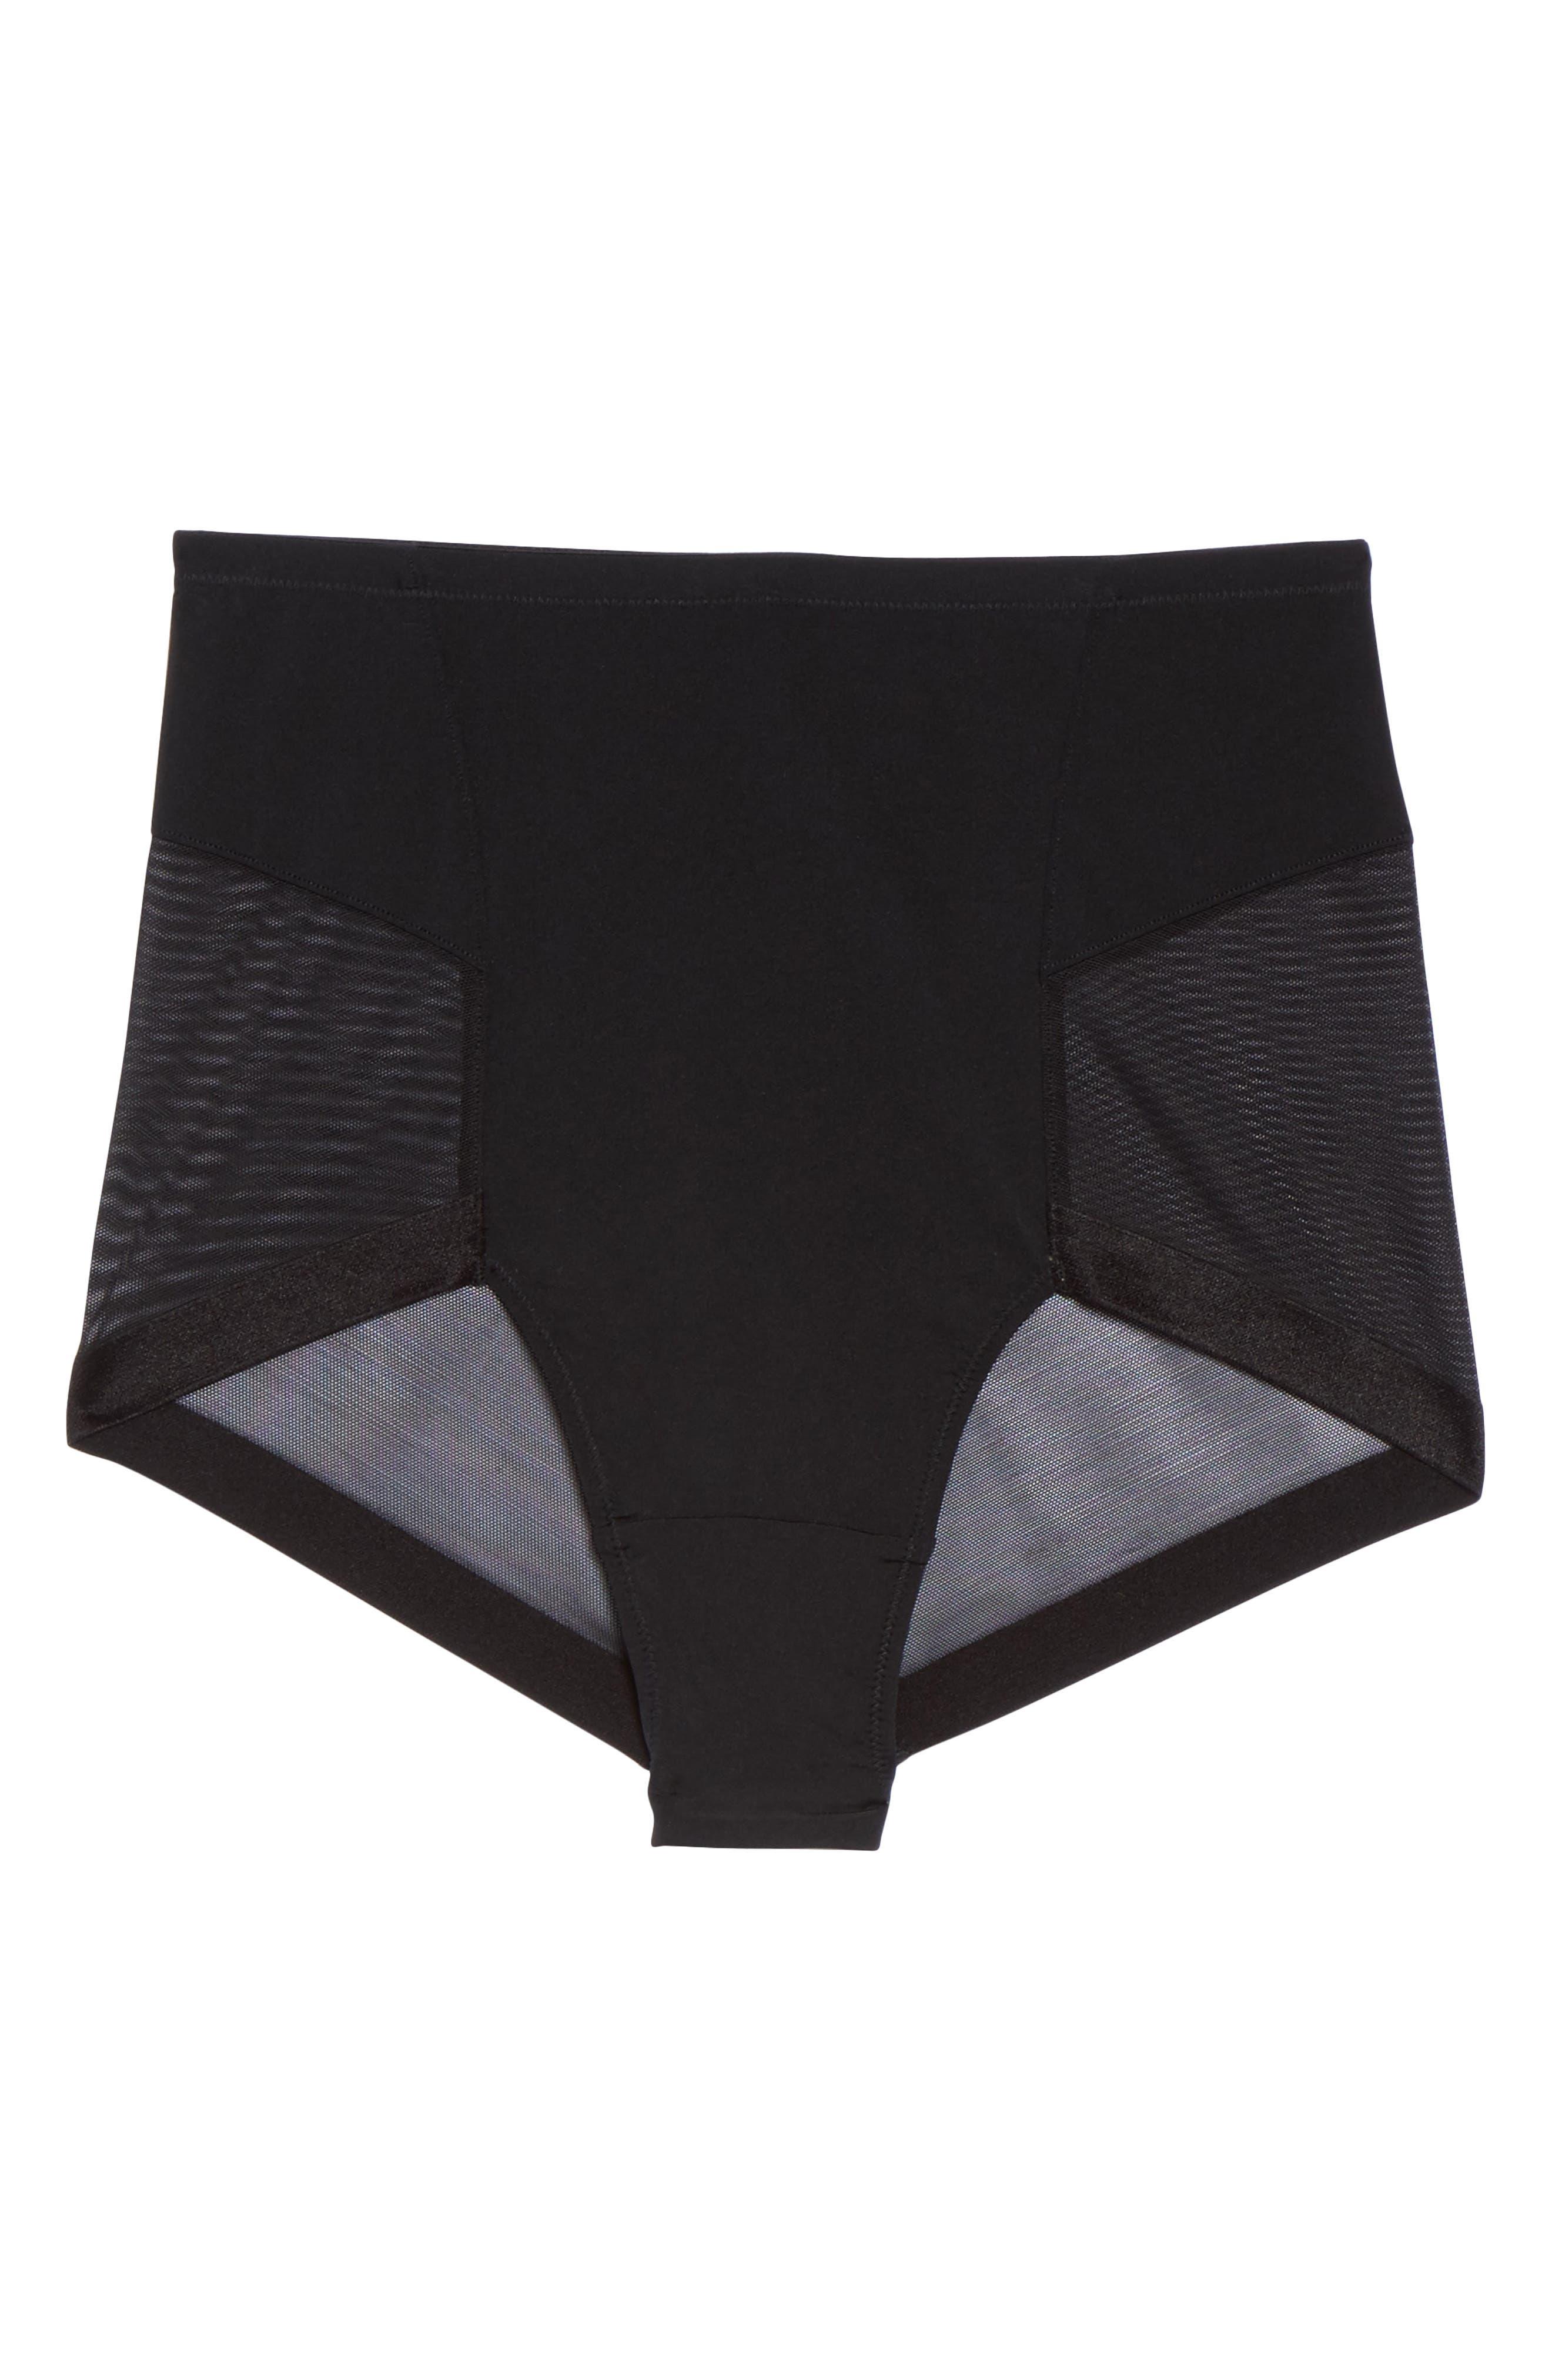 Infinite High Waist Shaper Panties,                             Alternate thumbnail 4, color,                             Black